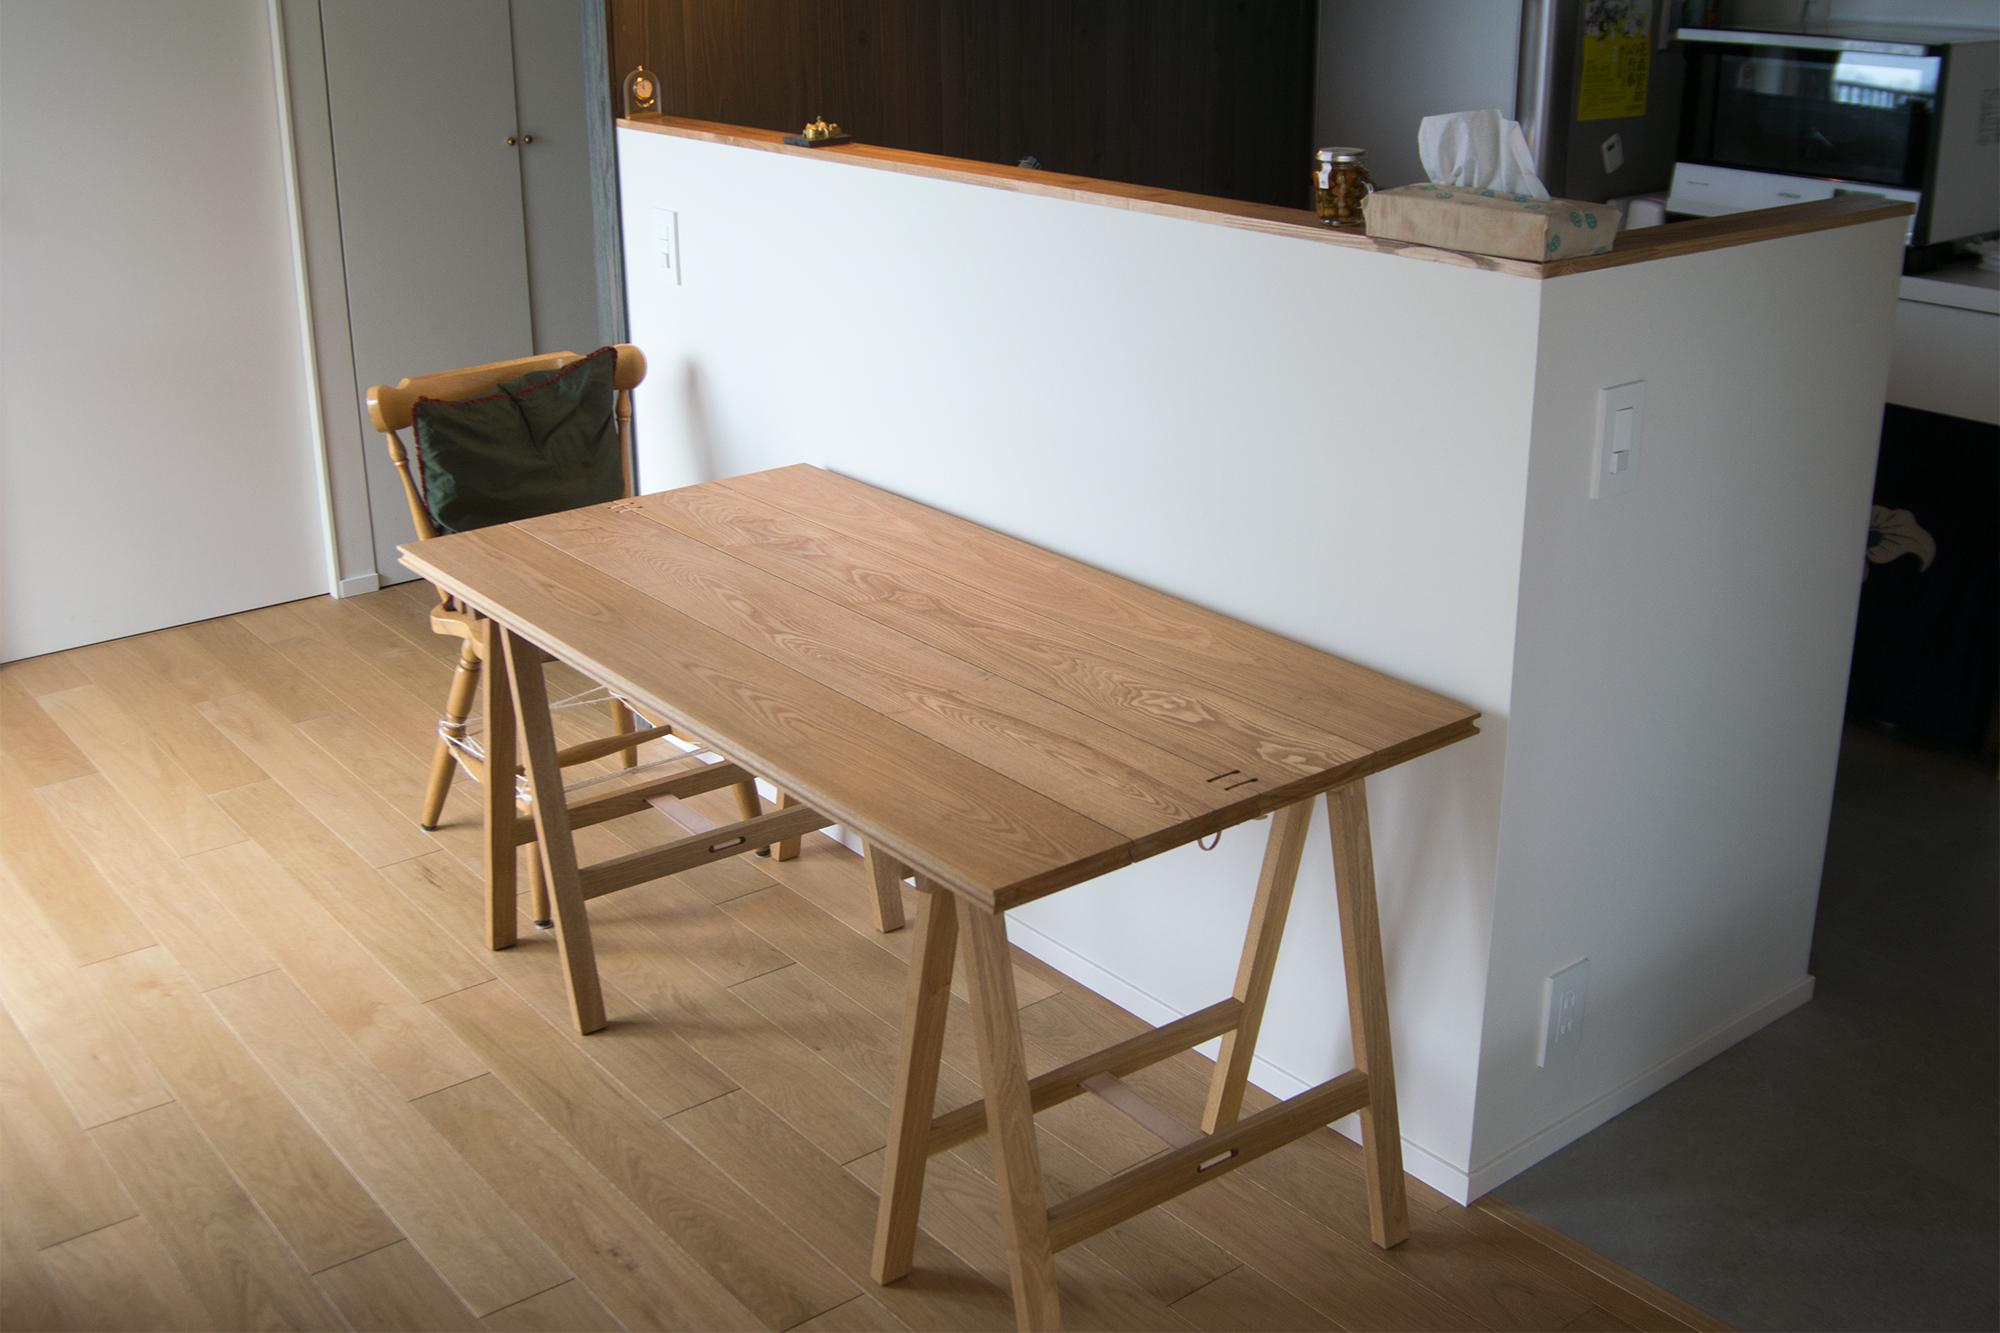 patam table パタムテーブル